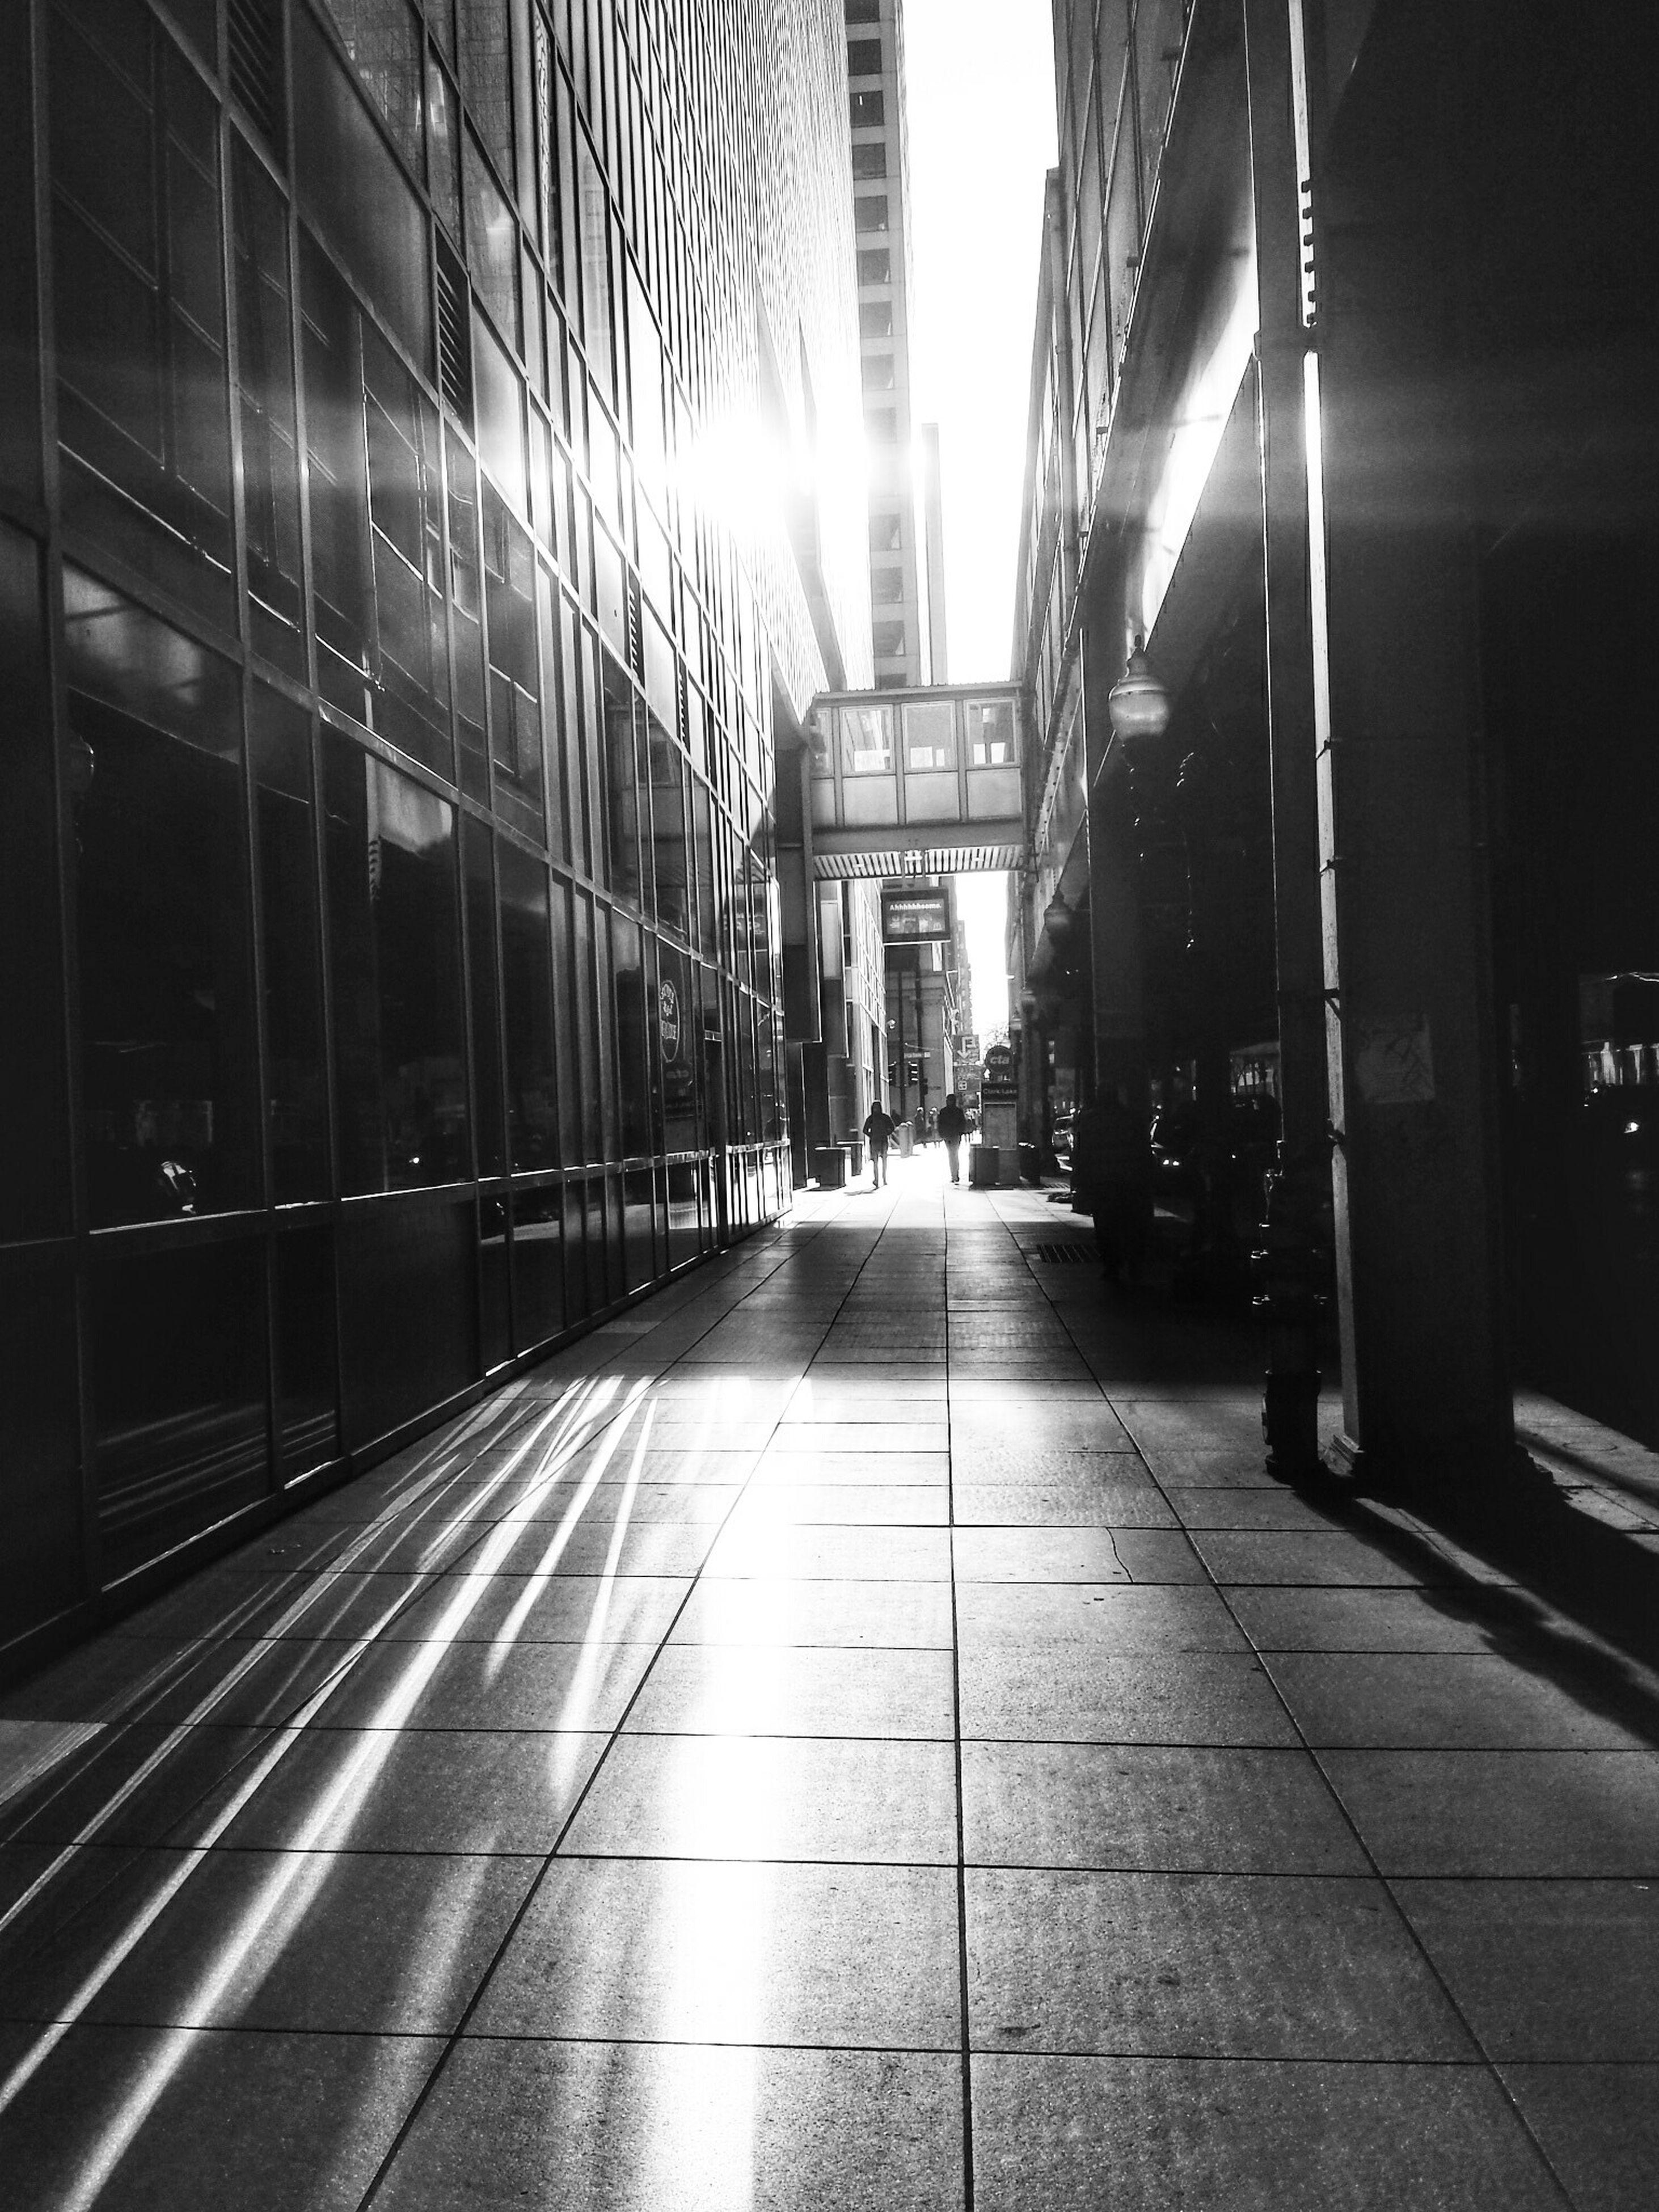 architecture, built structure, the way forward, building exterior, illuminated, diminishing perspective, city, empty, building, incidental people, vanishing point, transportation, street, city life, narrow, long, lighting equipment, night, walkway, corridor